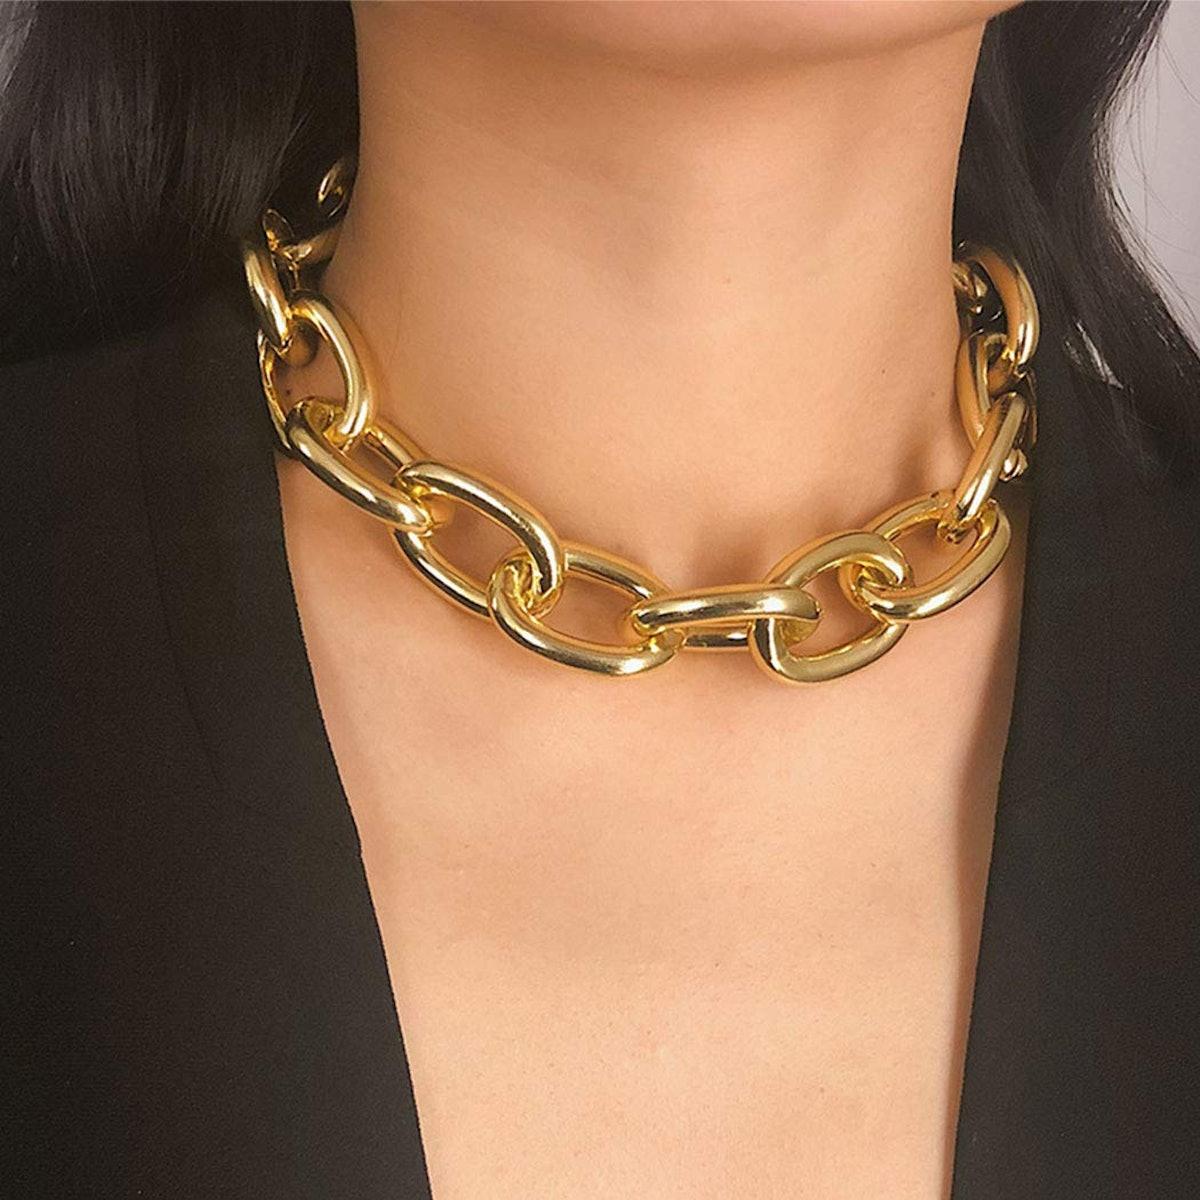 CLOACE Chunky Choker Necklace